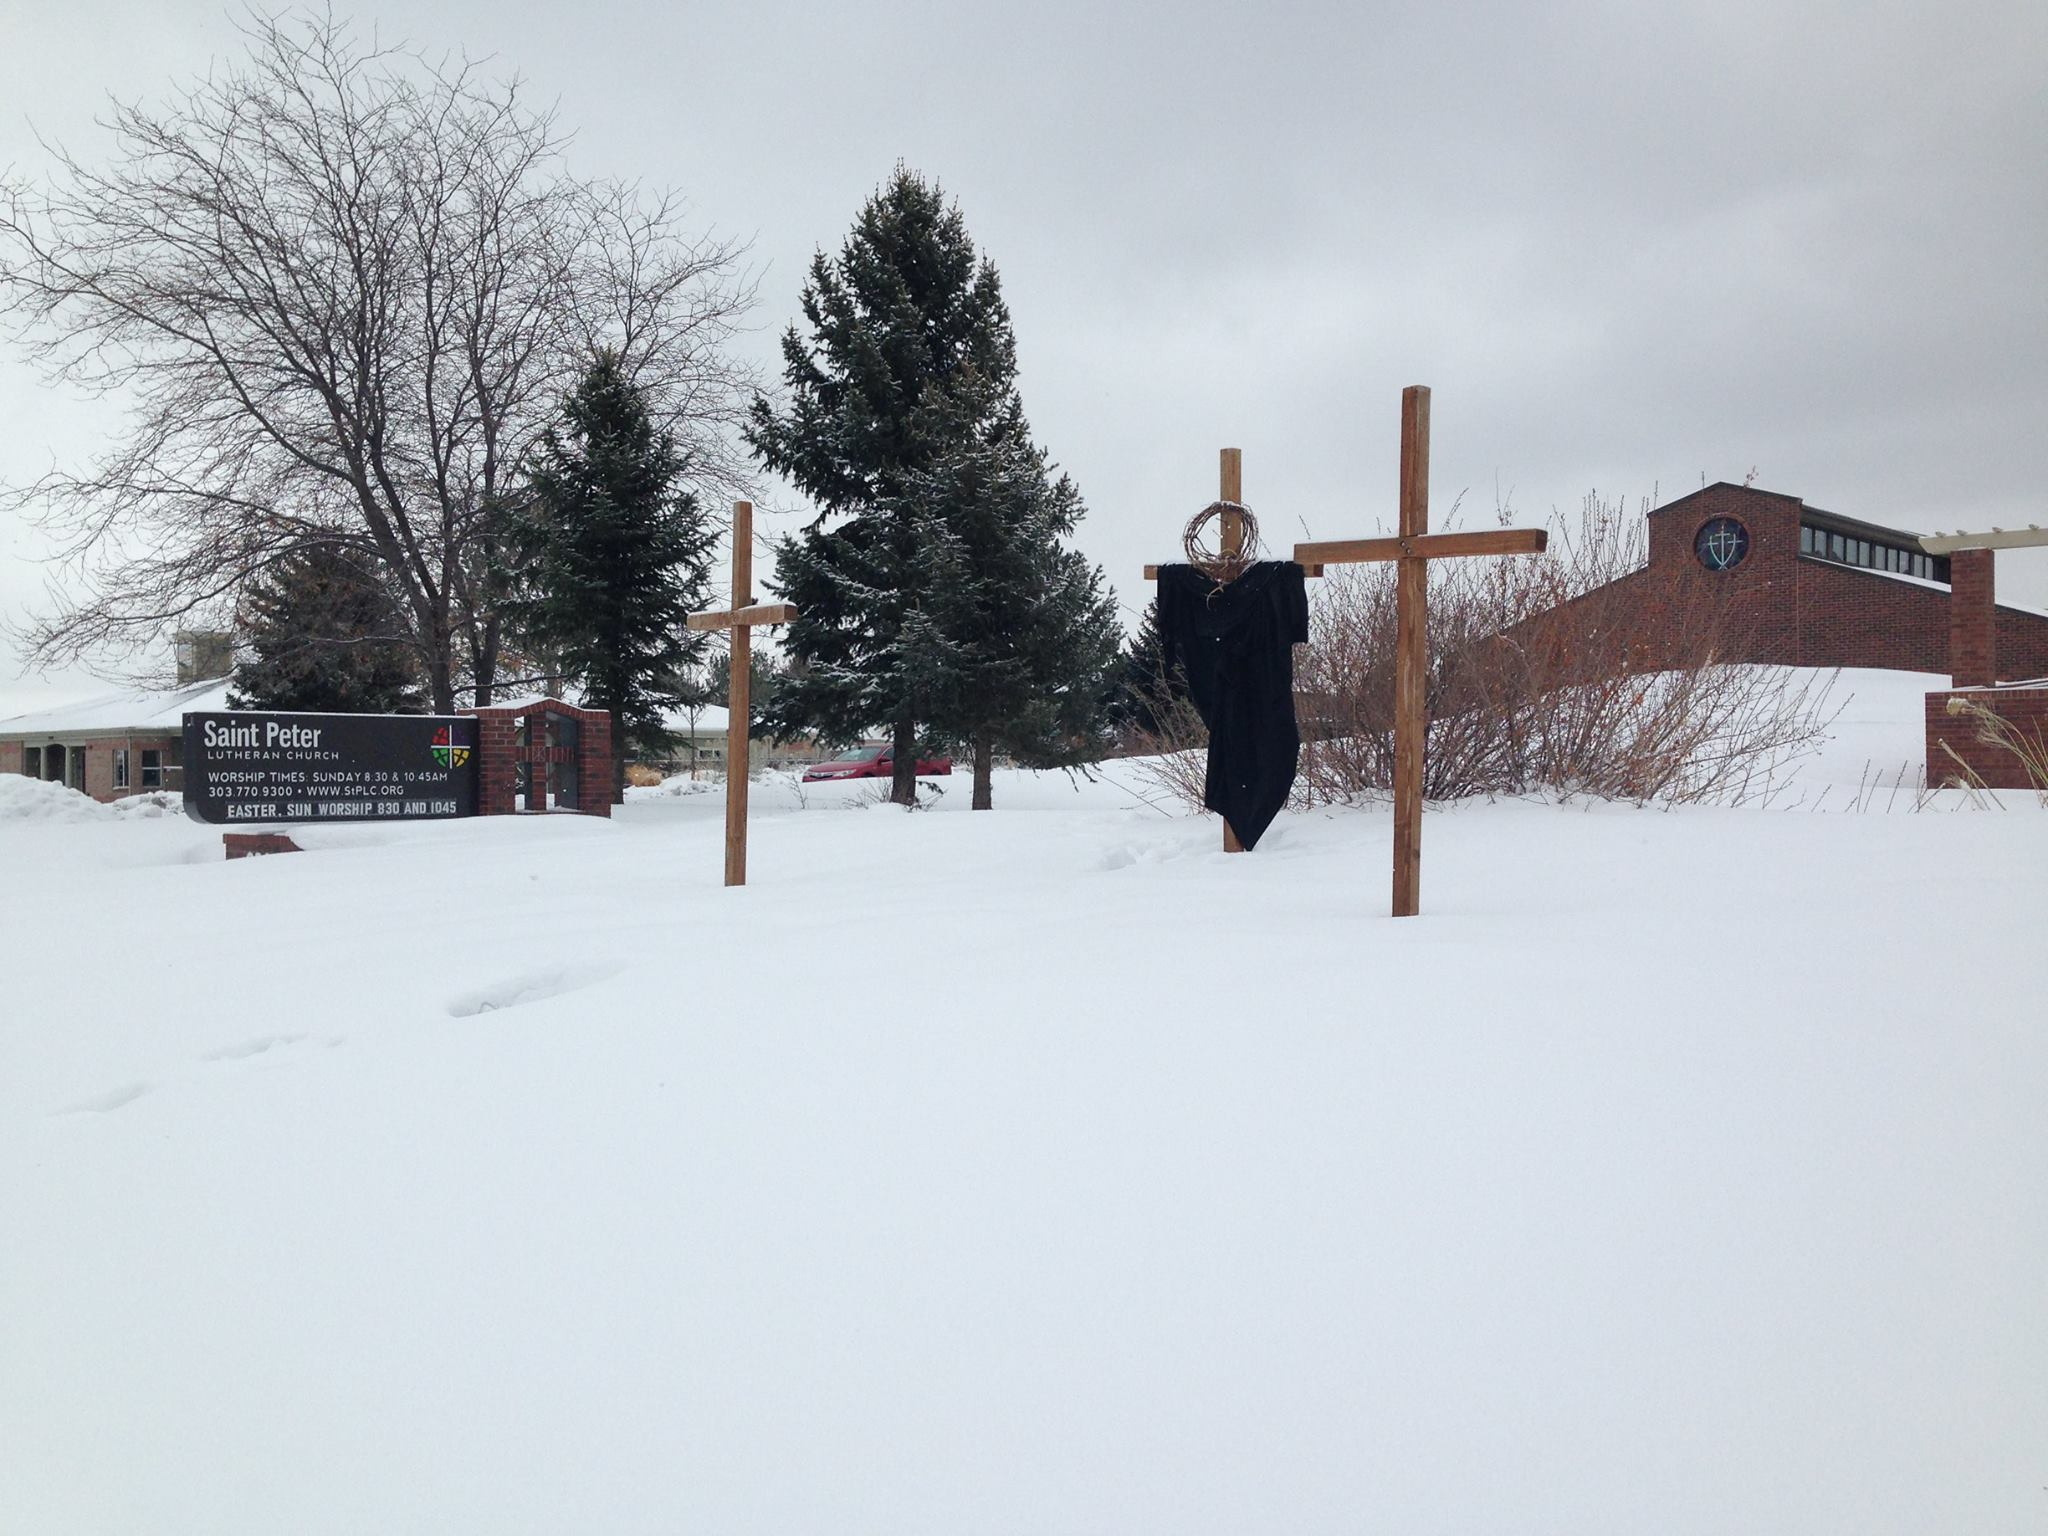 saint-peter-greenwood-village (1).jpg